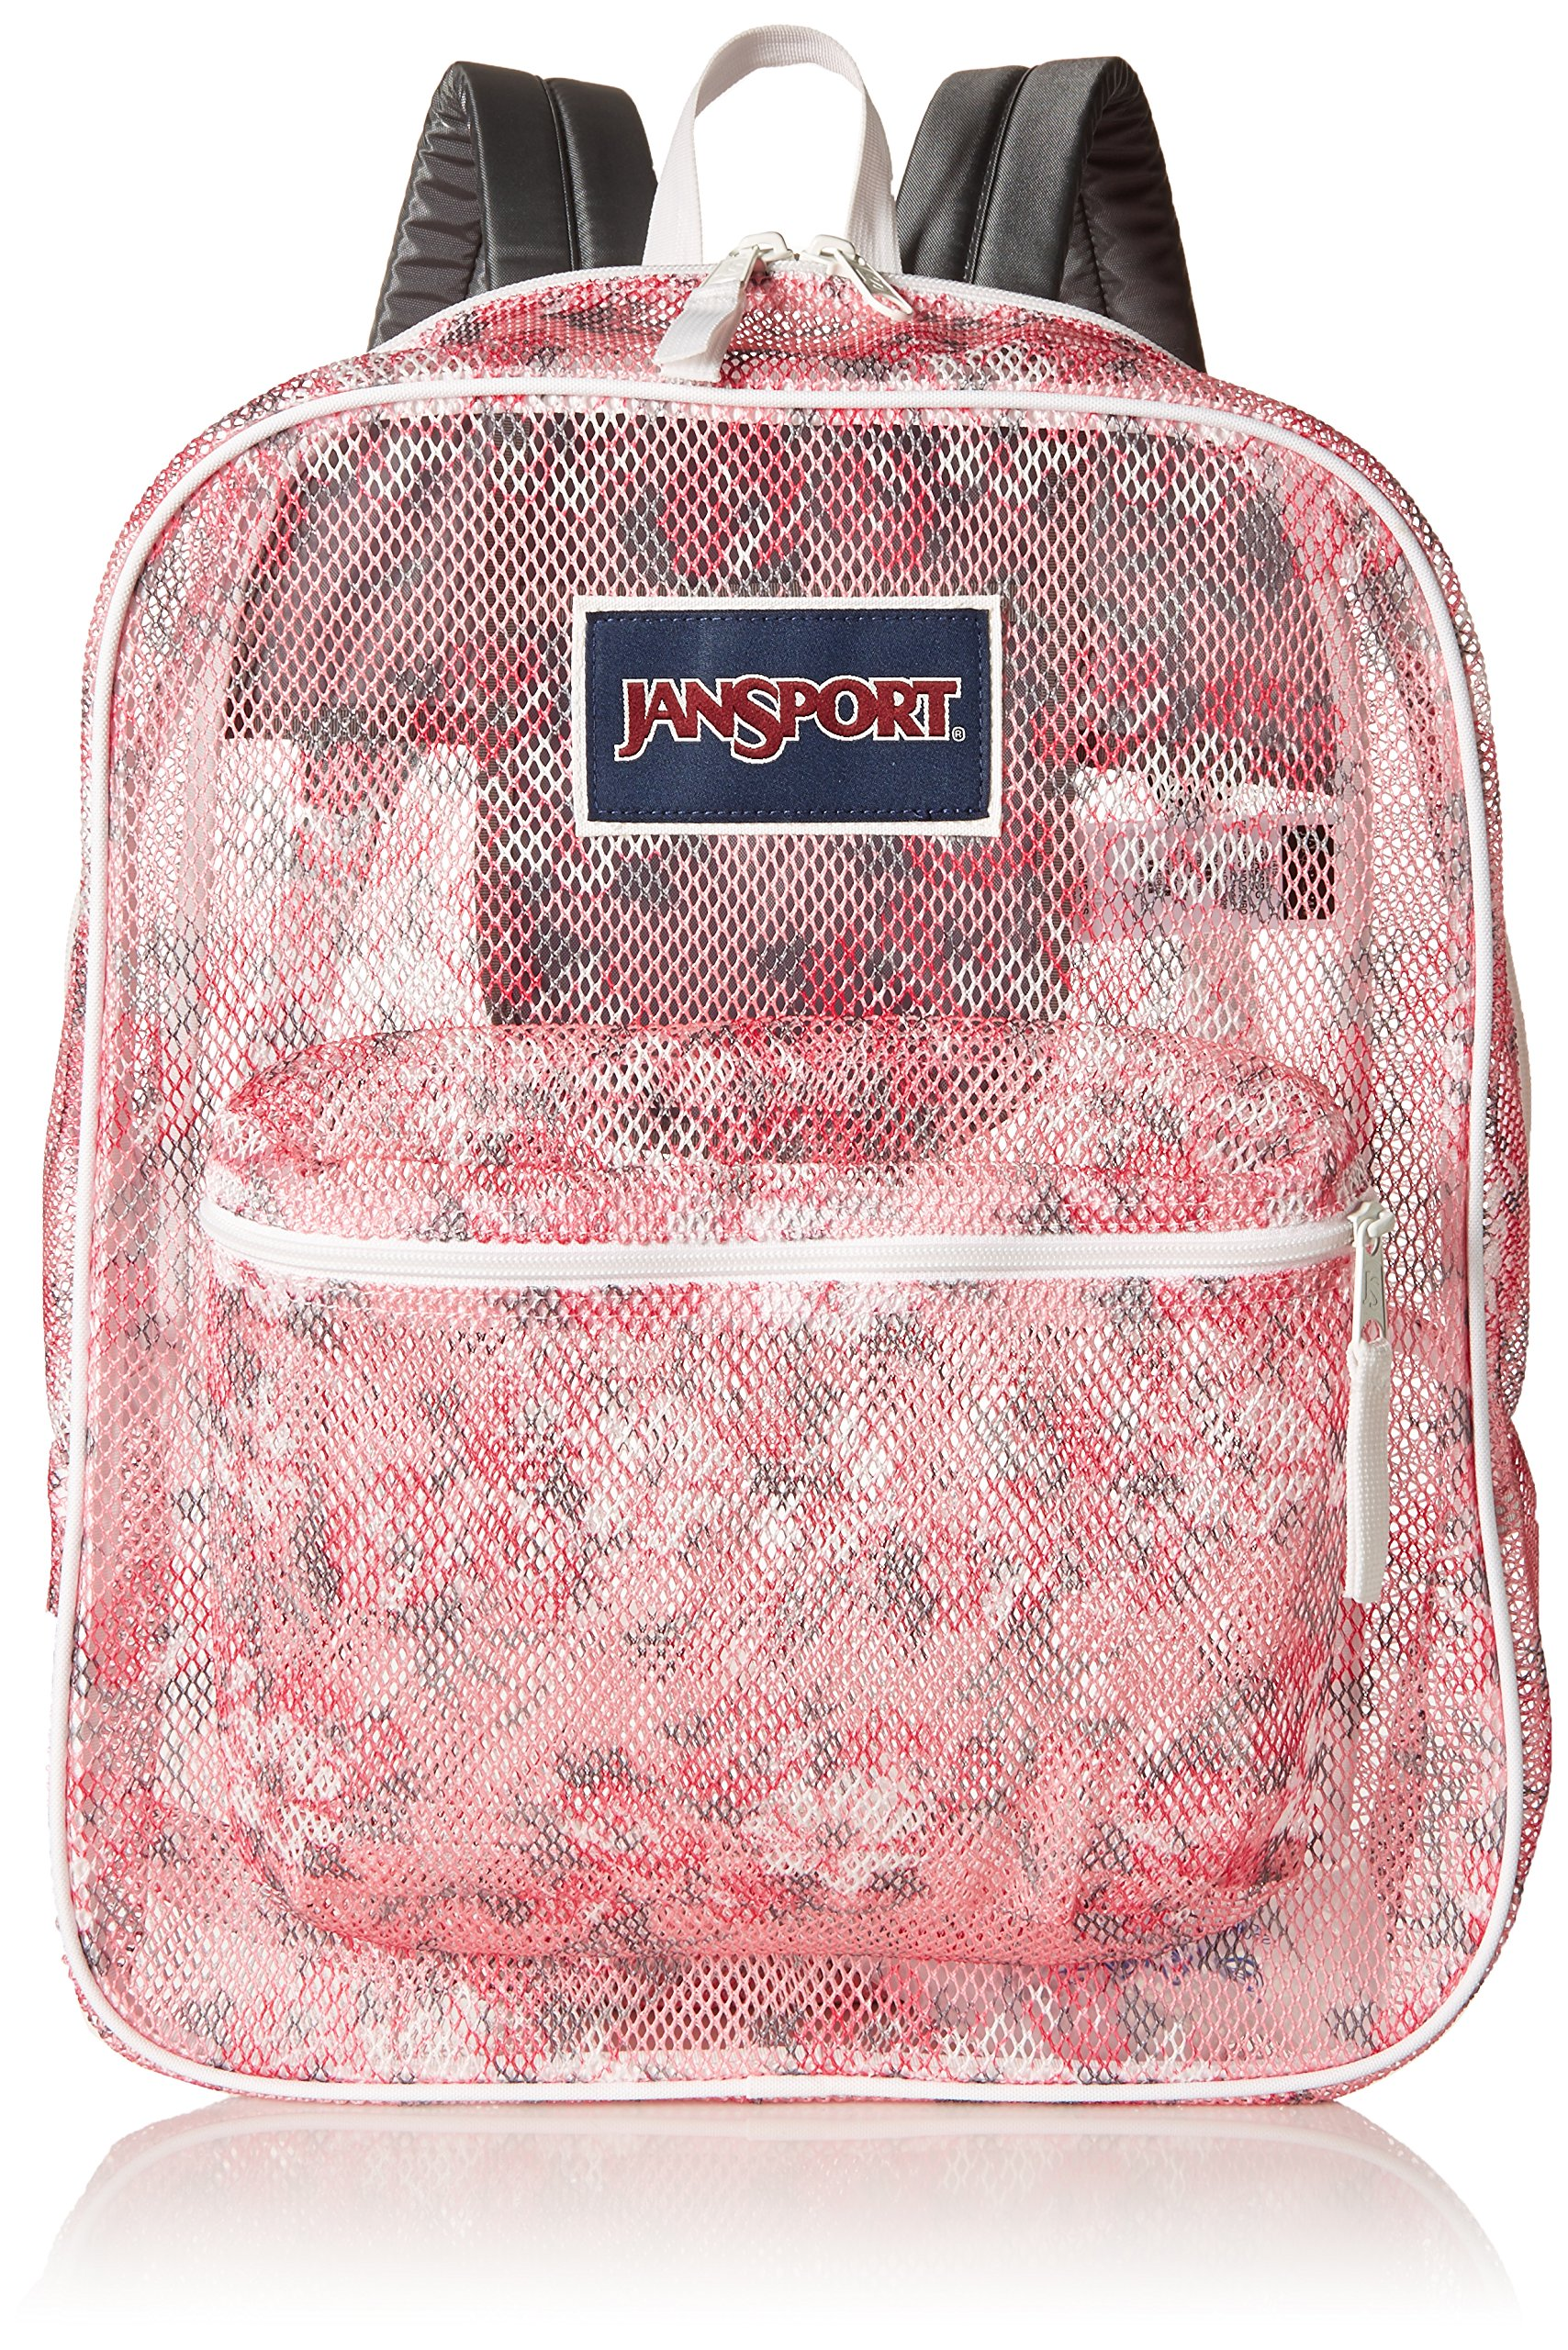 Purple Mesh Jansport Backpack- Fenix Toulouse Handball e4c1b62c556b1